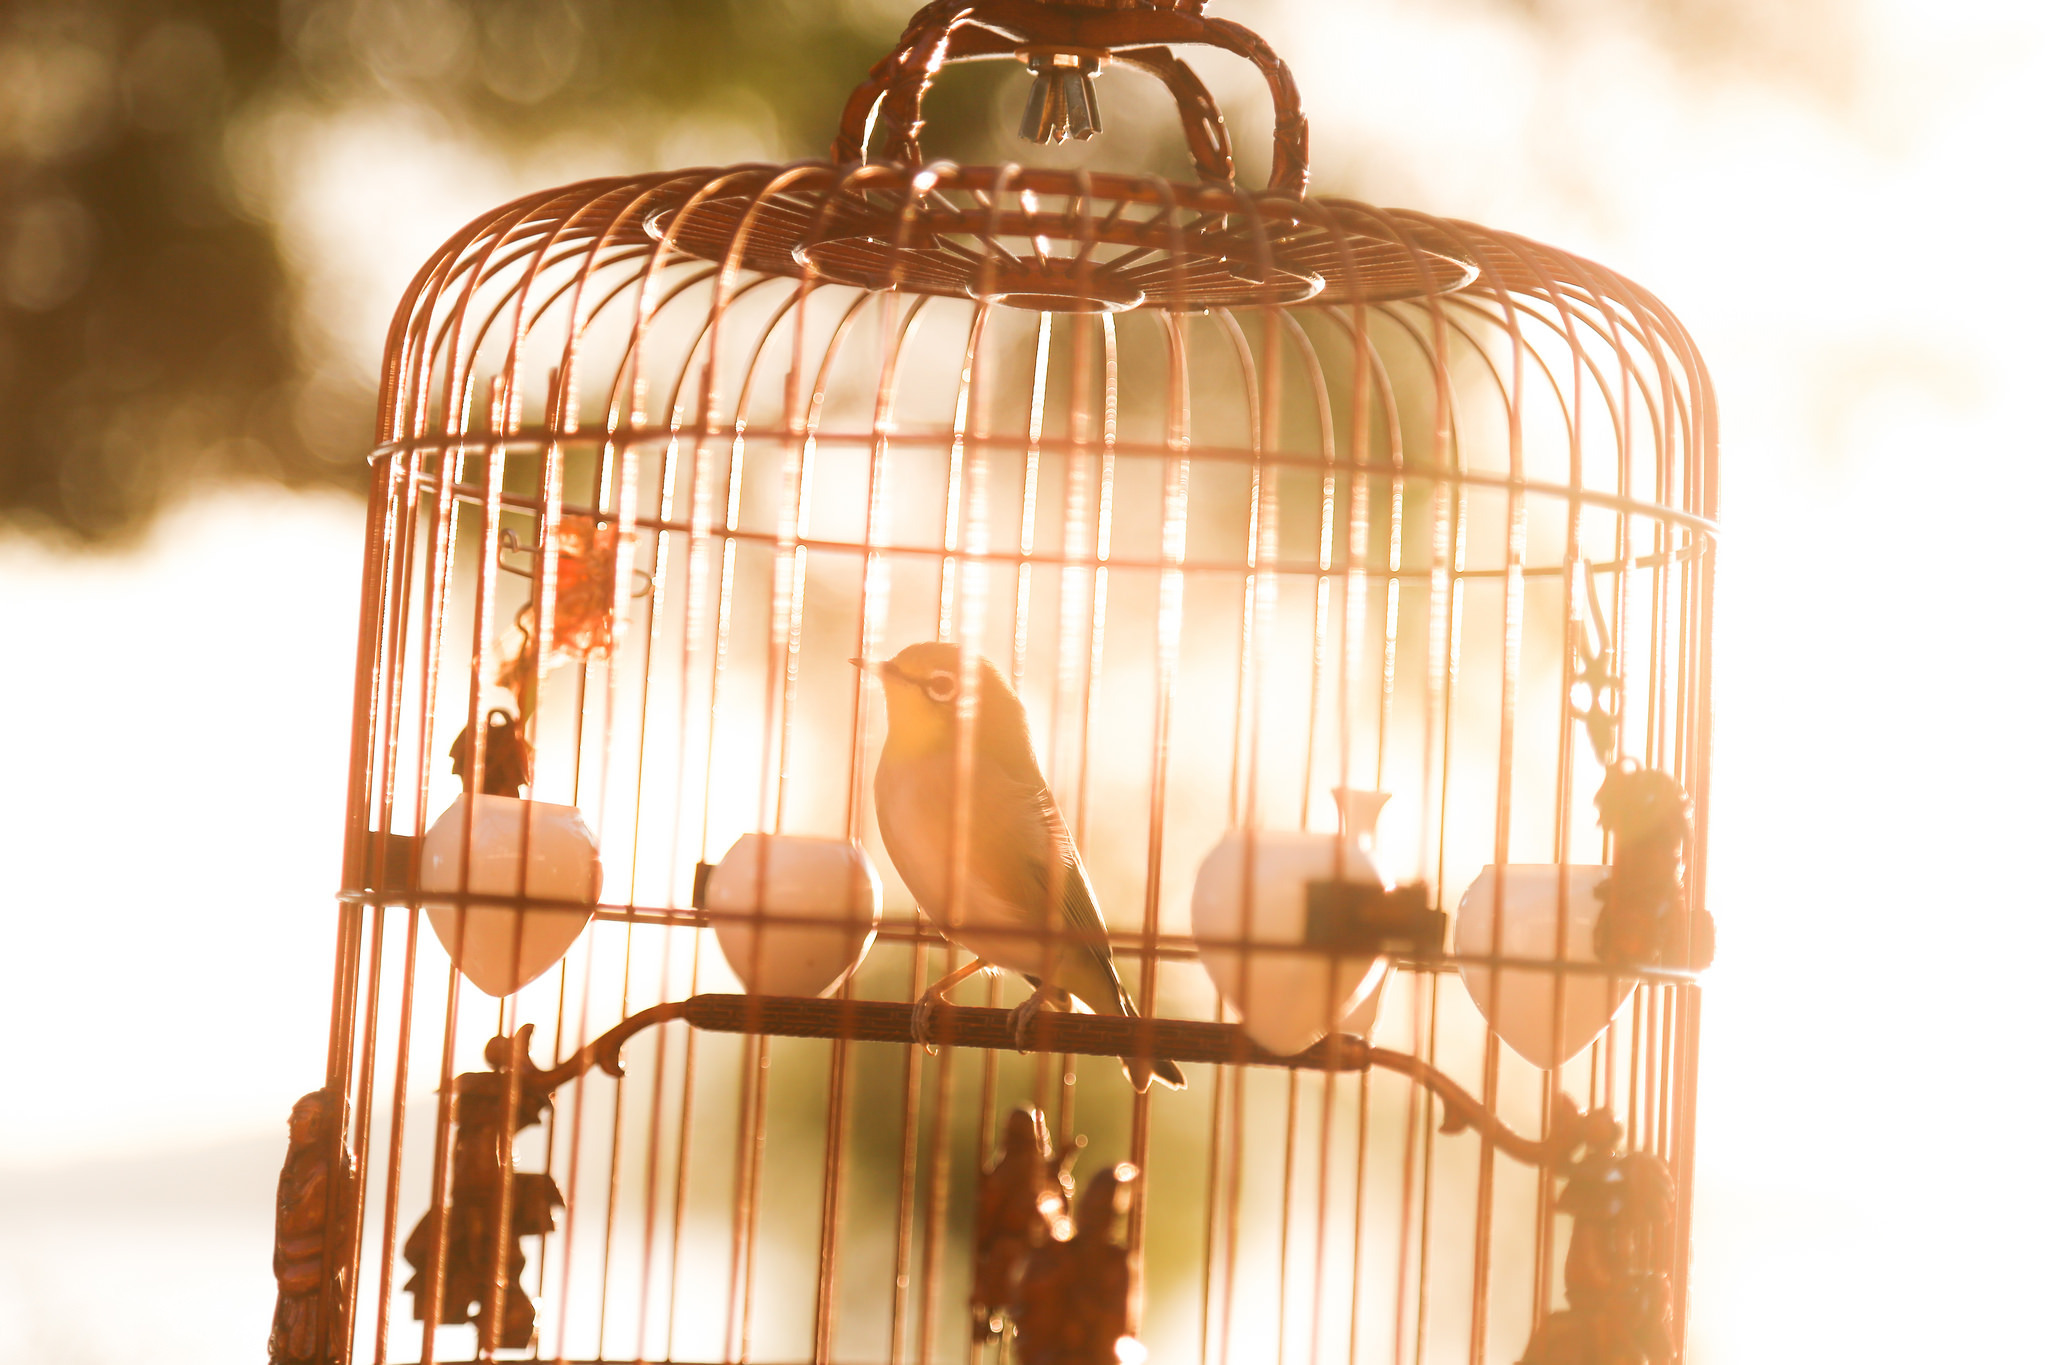 BIRD IN THE GOLDEN CAGE